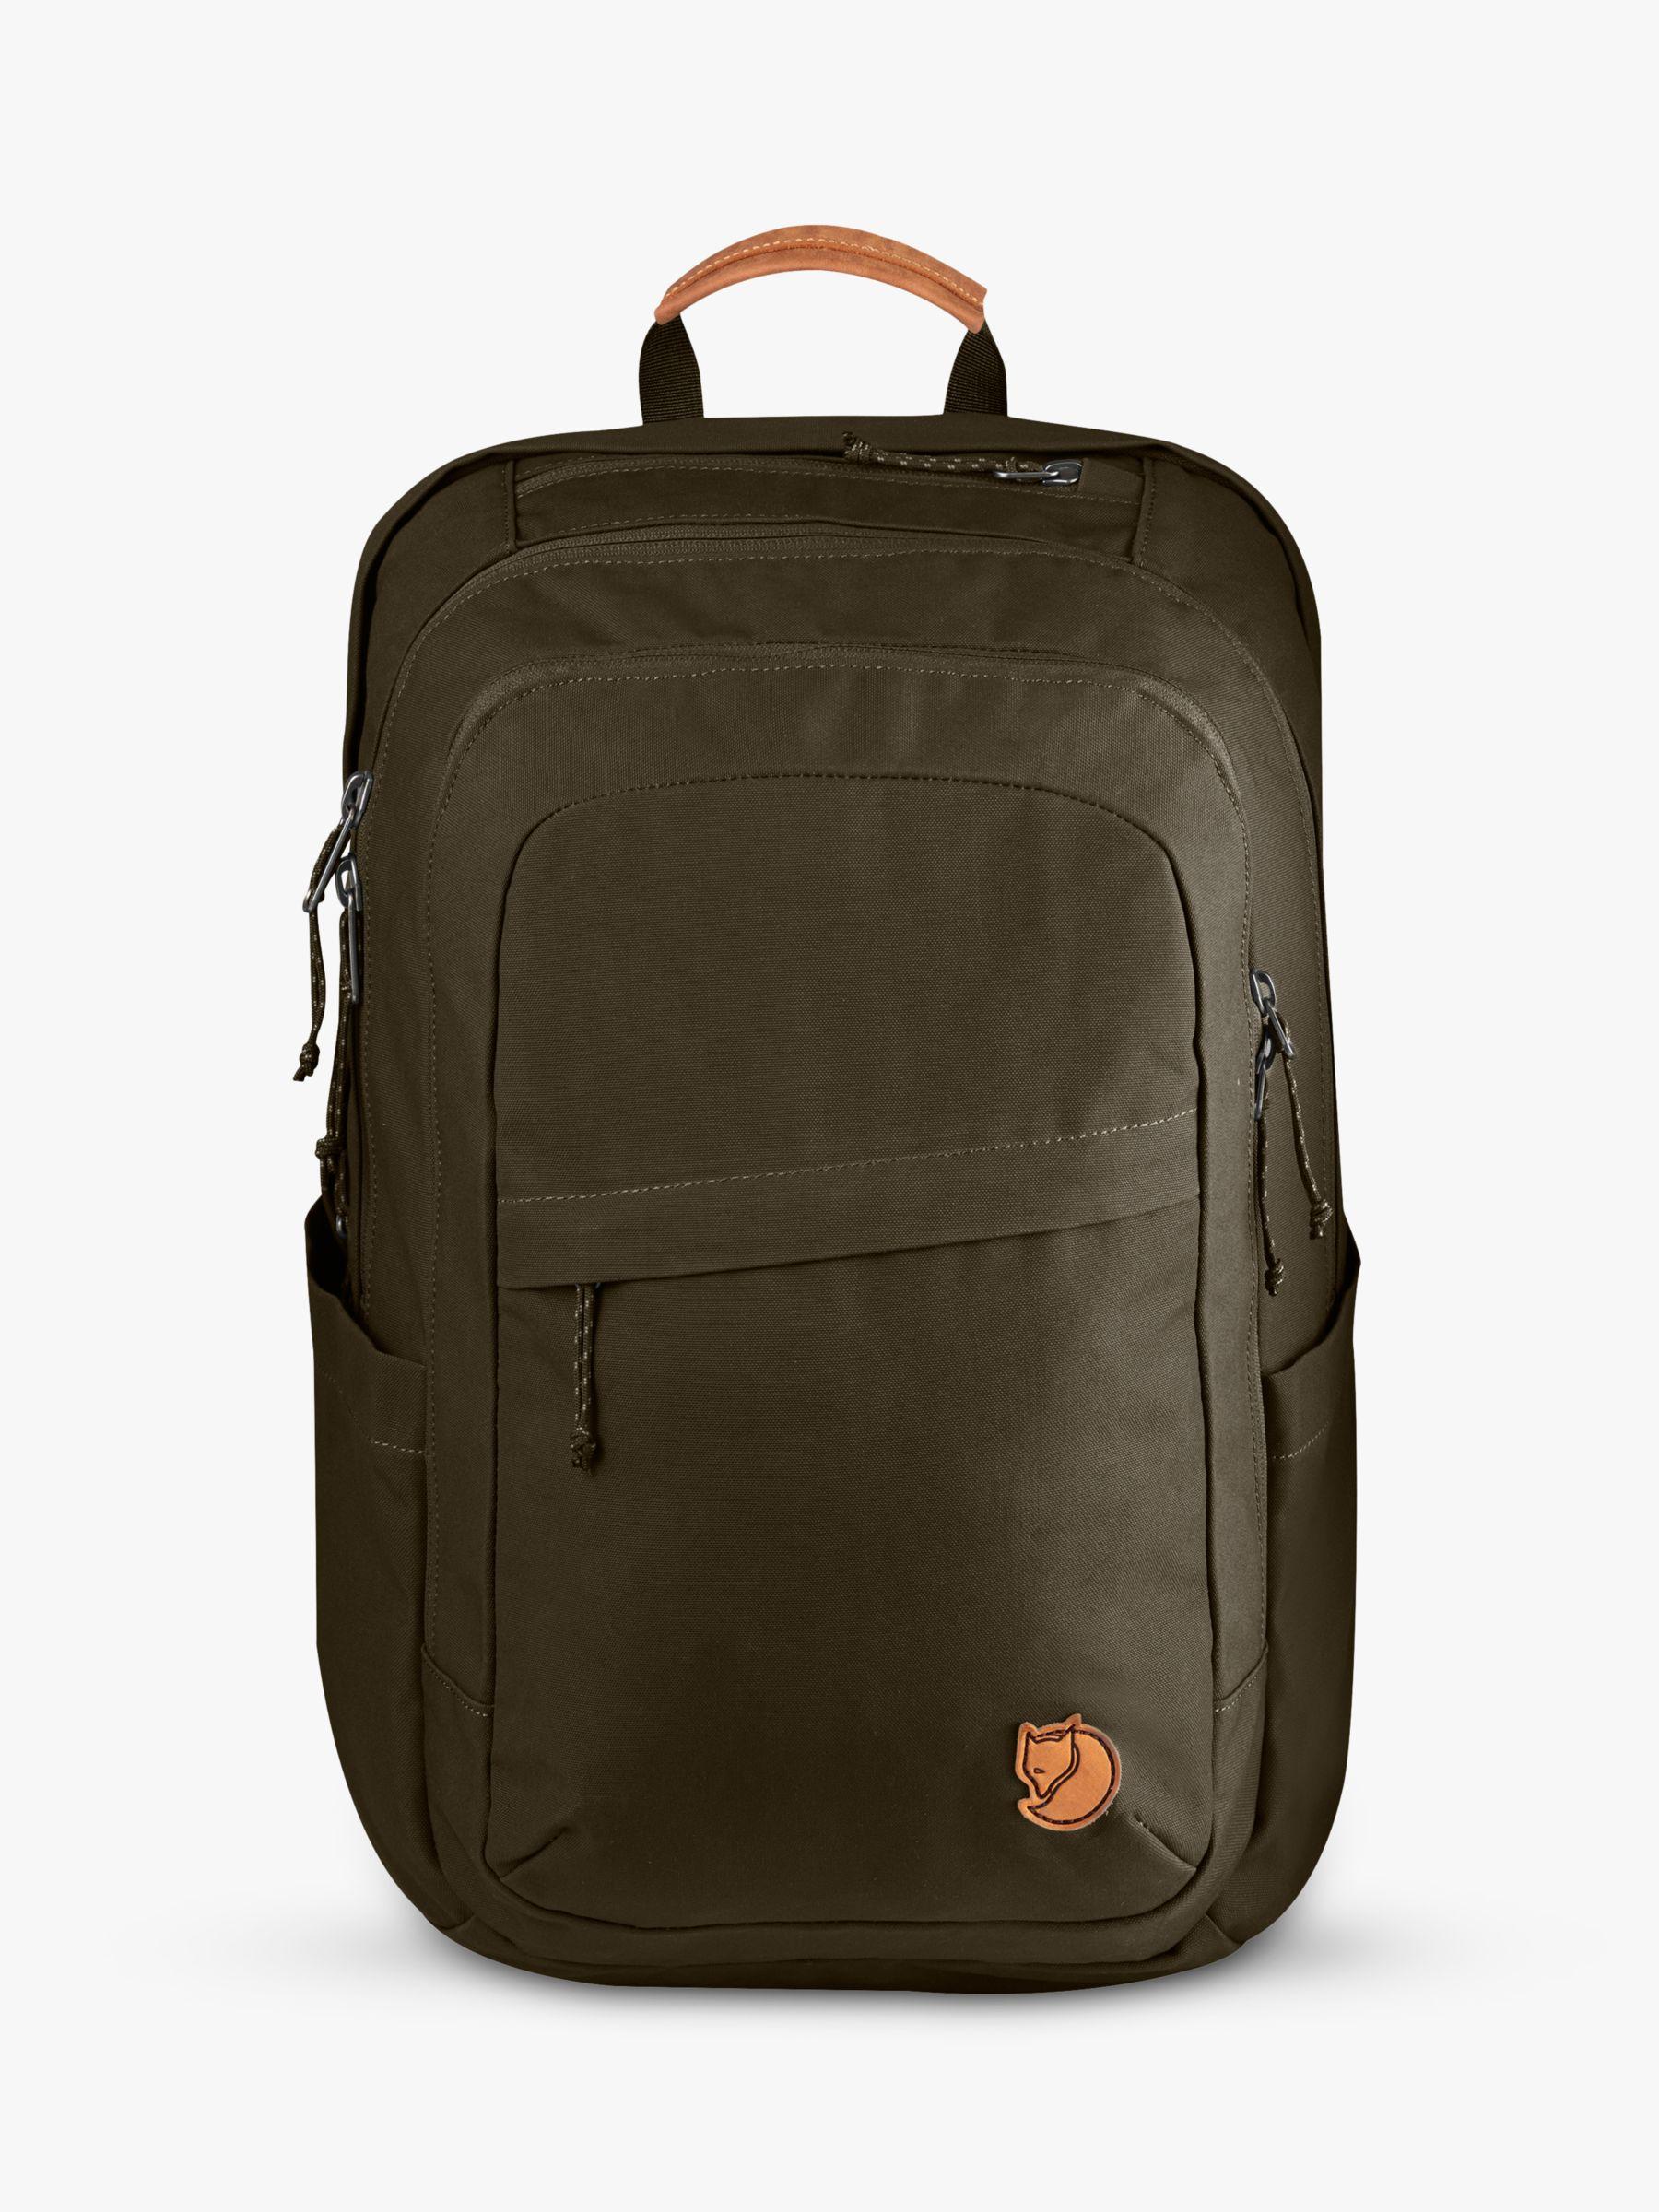 Fjallraven Fjällräven Raven 28L Backpack, Dark Olive